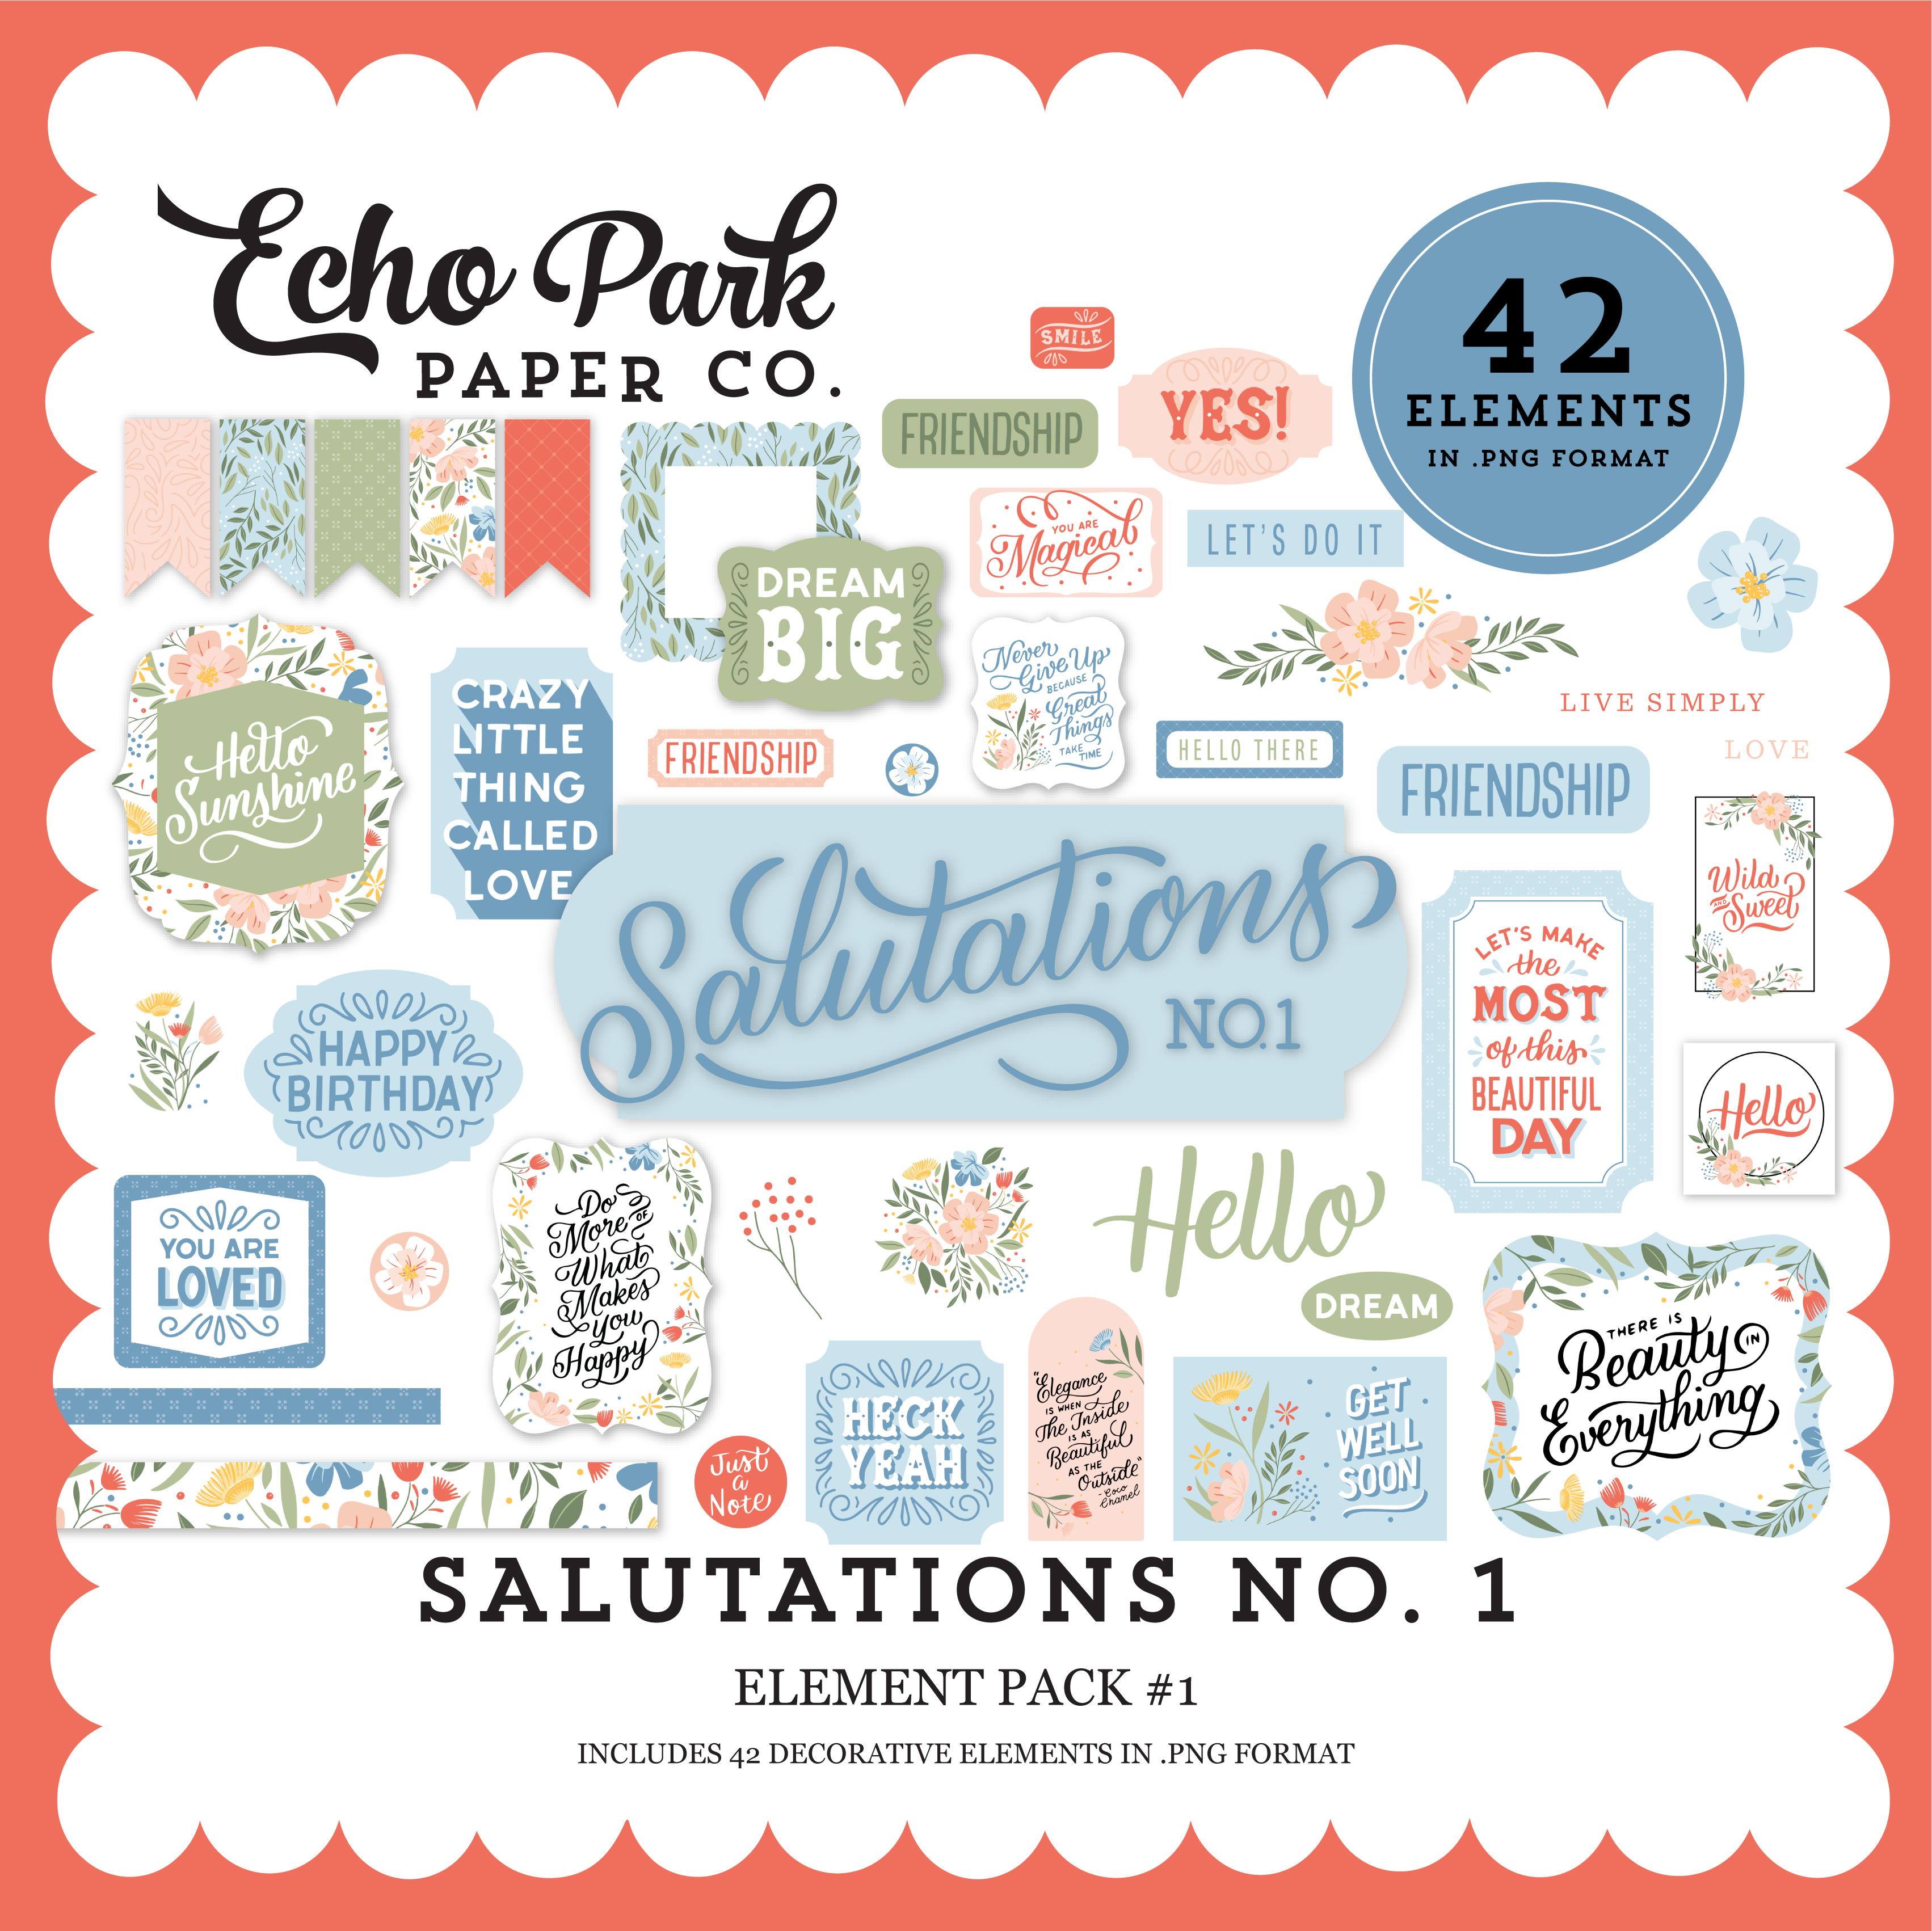 Salutations No. 1 Element Pack #1